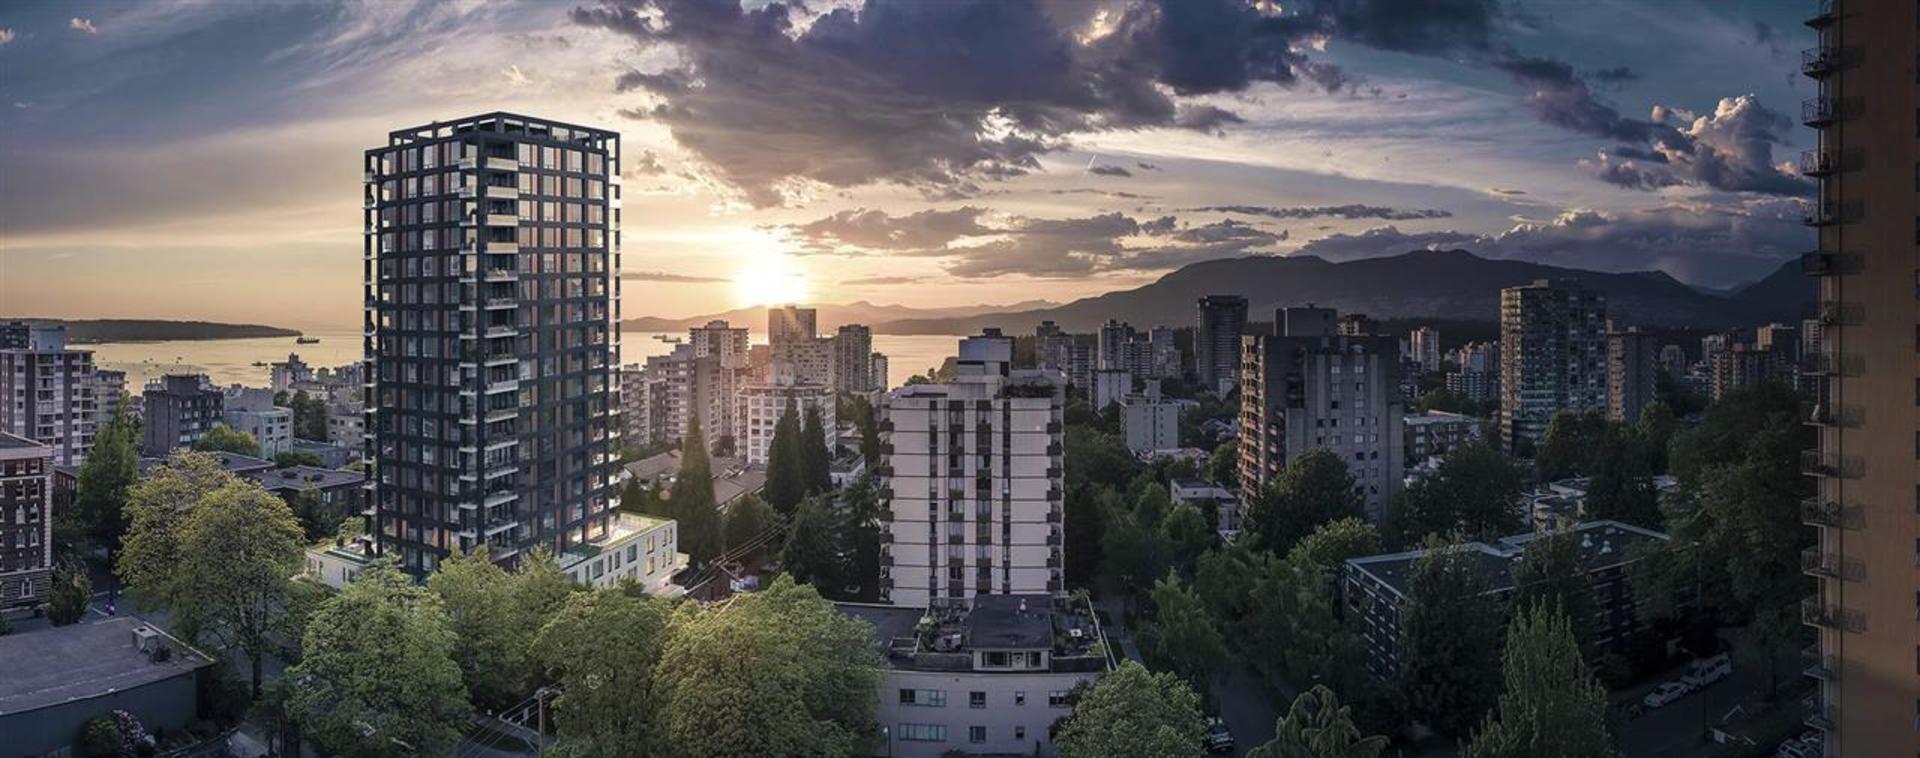 1171-jervis-street-west-end-vw-vancouver-west-11 at 701 - 1171 Jervis Street, West End VW, Vancouver West